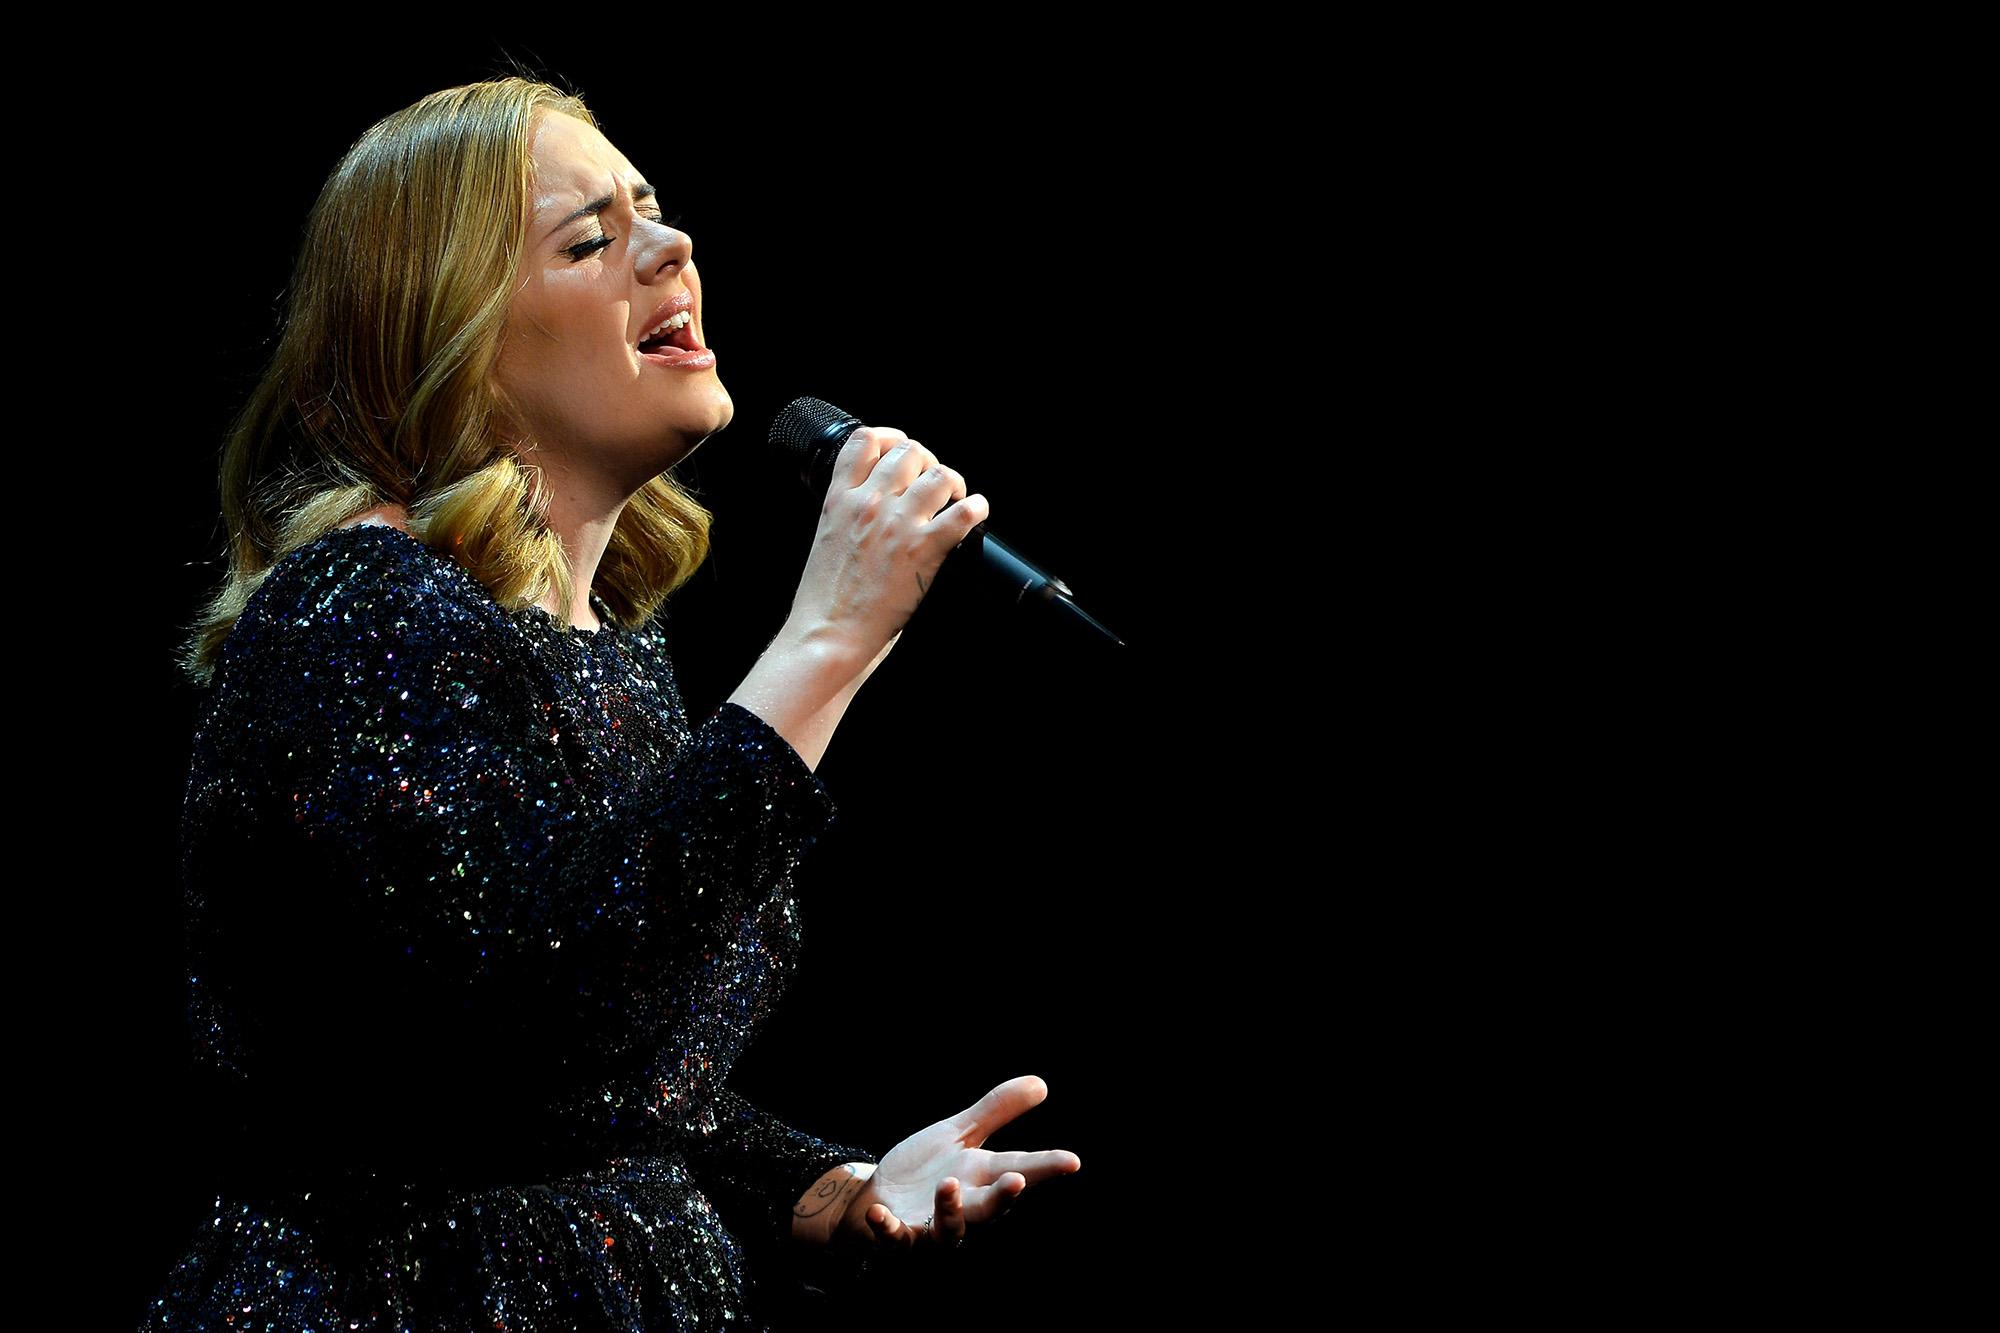 ANTWERPEN, BELGIUM - JUNE 12:  Adele performs at SportPaleis (Photo by Sascha Steinbach/Getty Images)